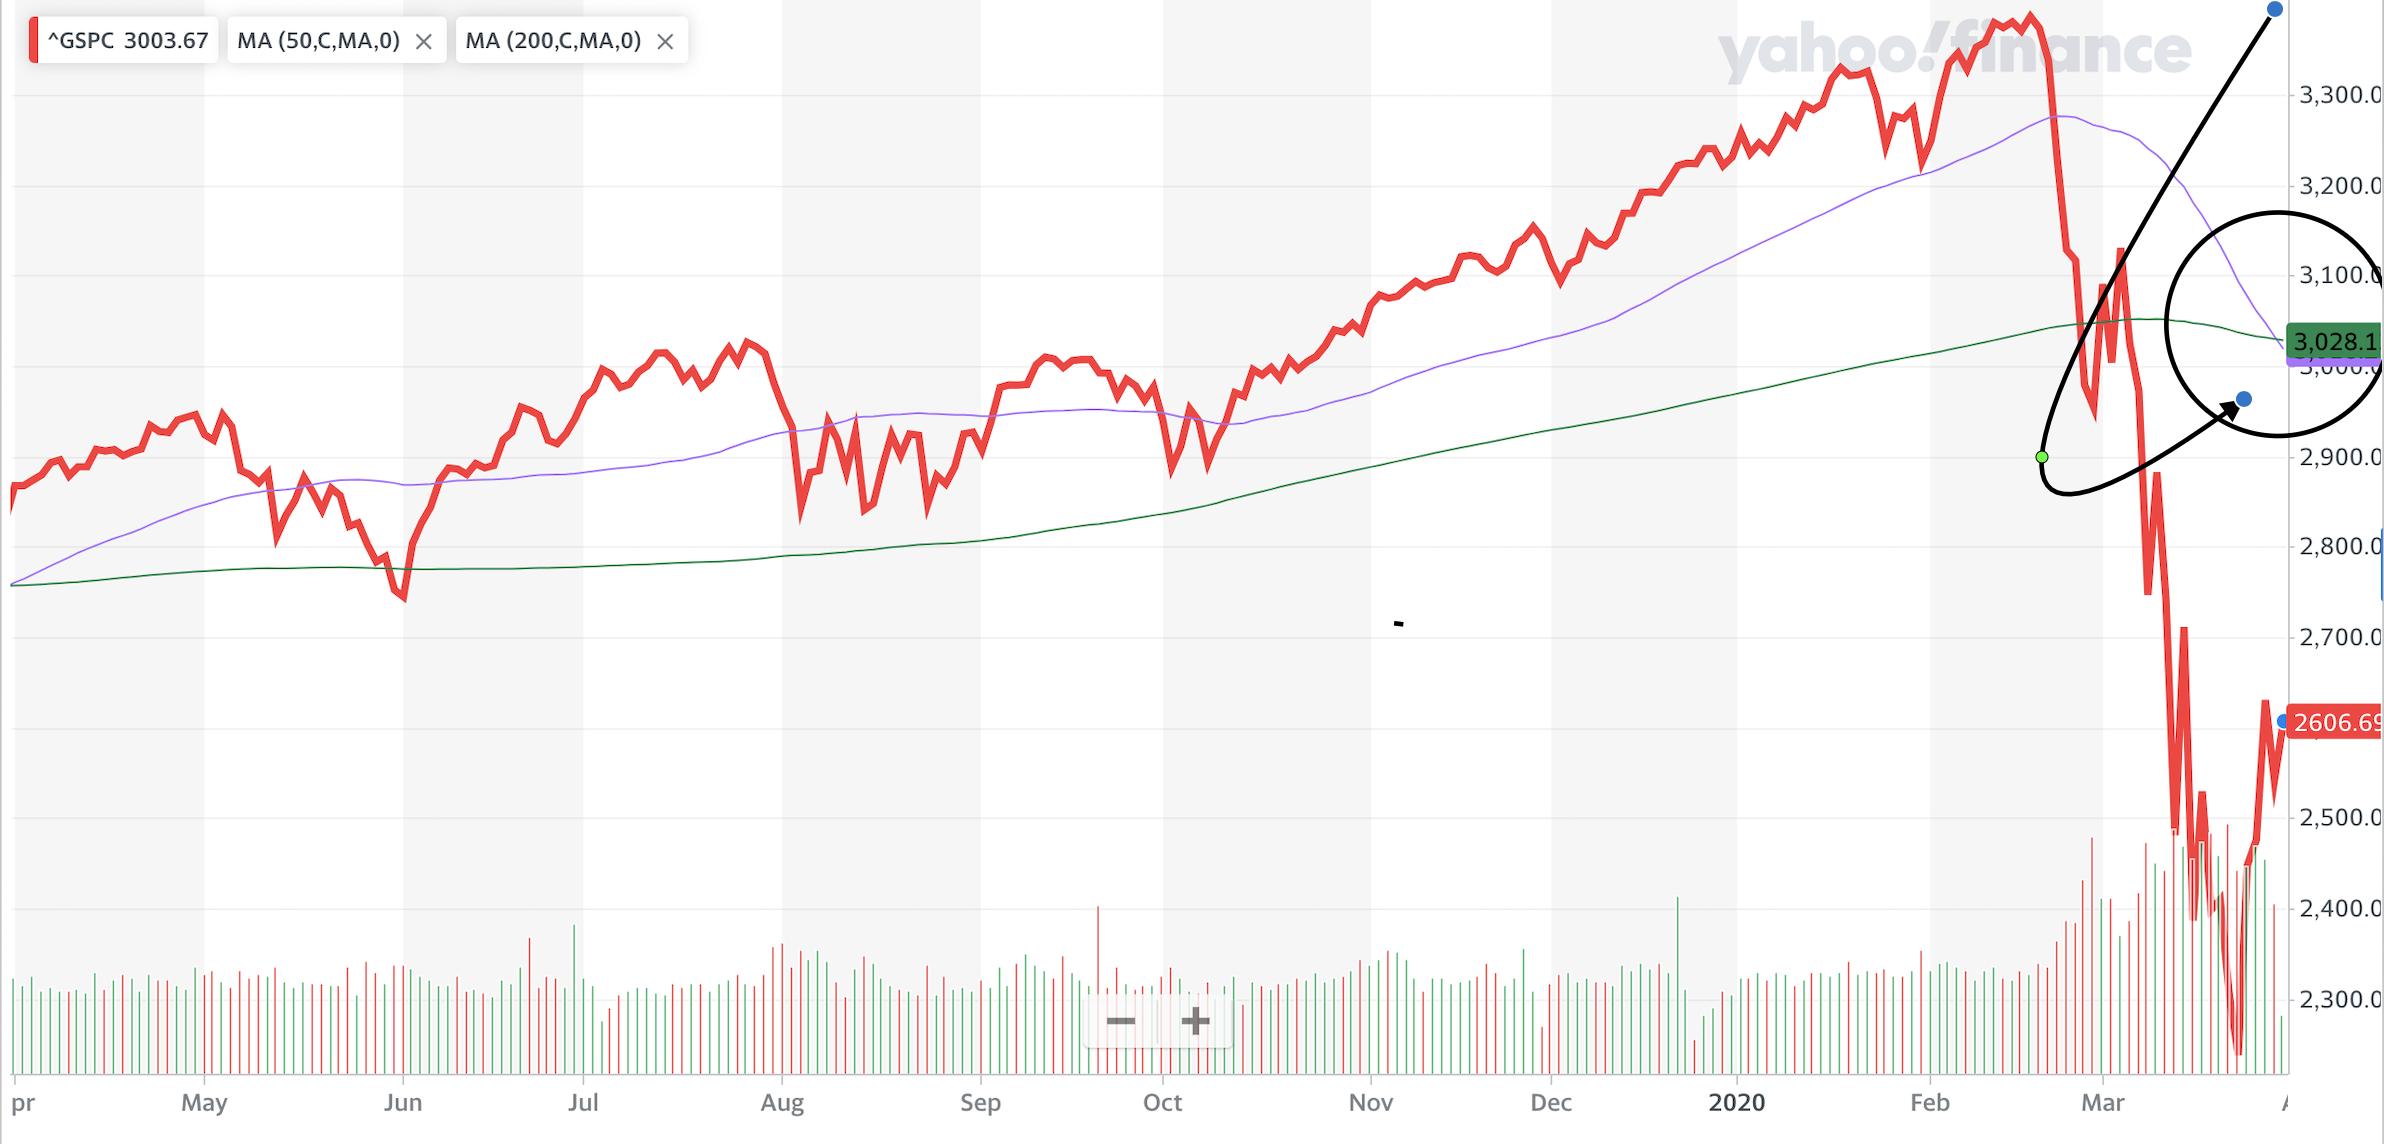 Coronavirus stock market rally triggers major S&P 500 sell signal: the dreaded 'death cross'